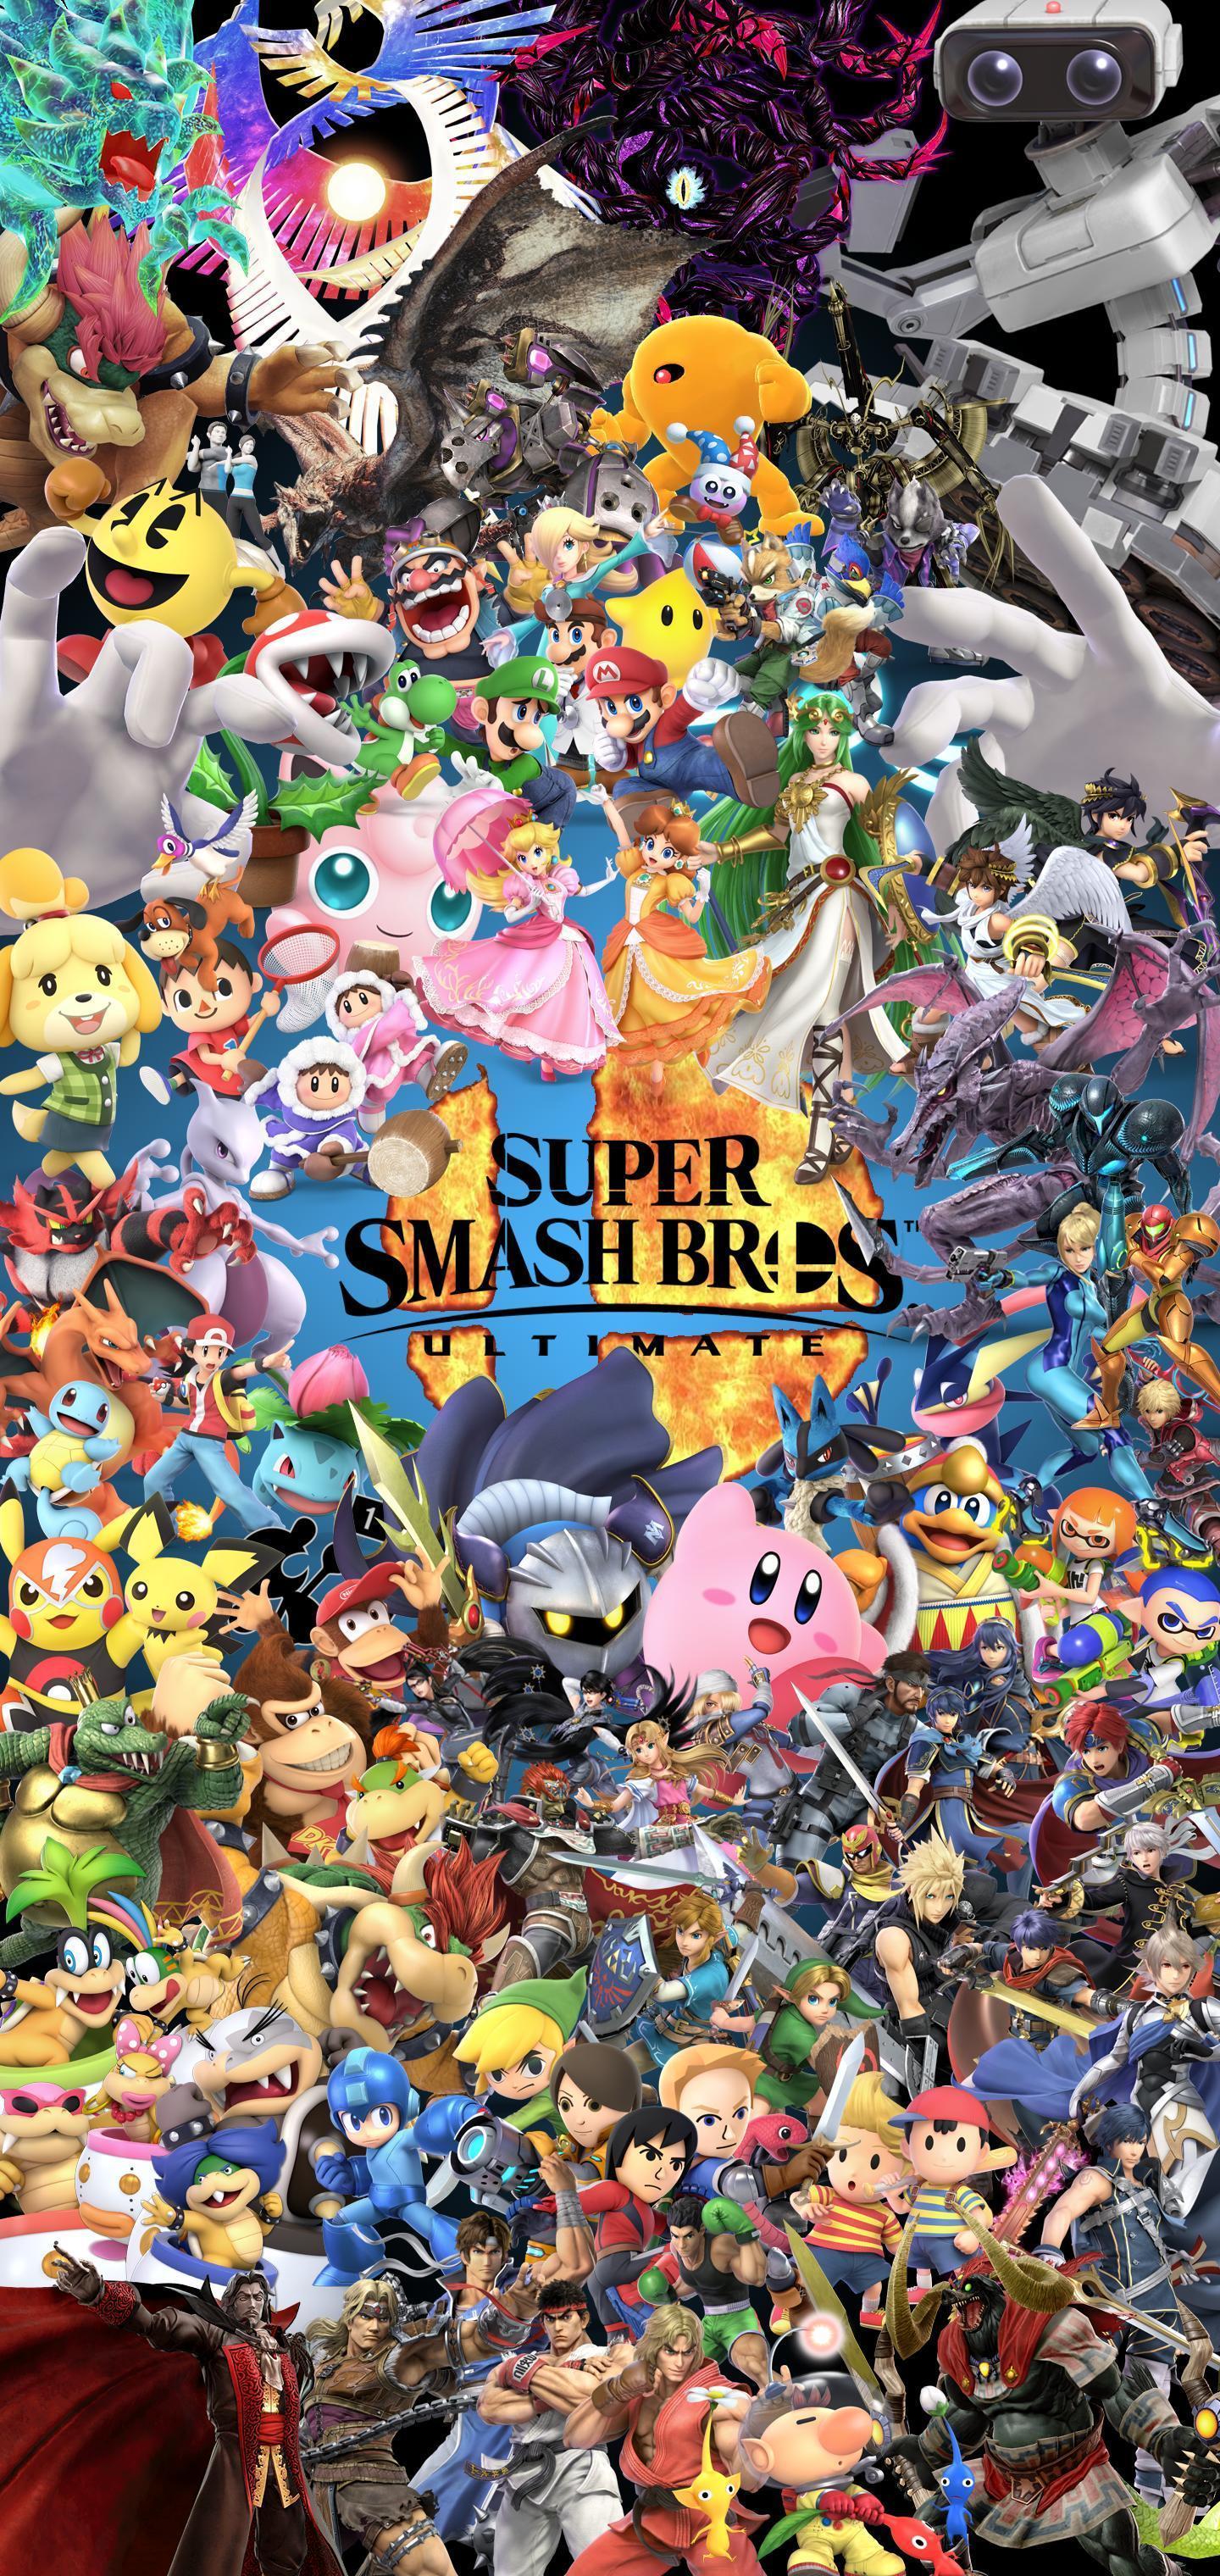 Super Smash Bros: Ultimate Wallpapers - Top Free Super ...